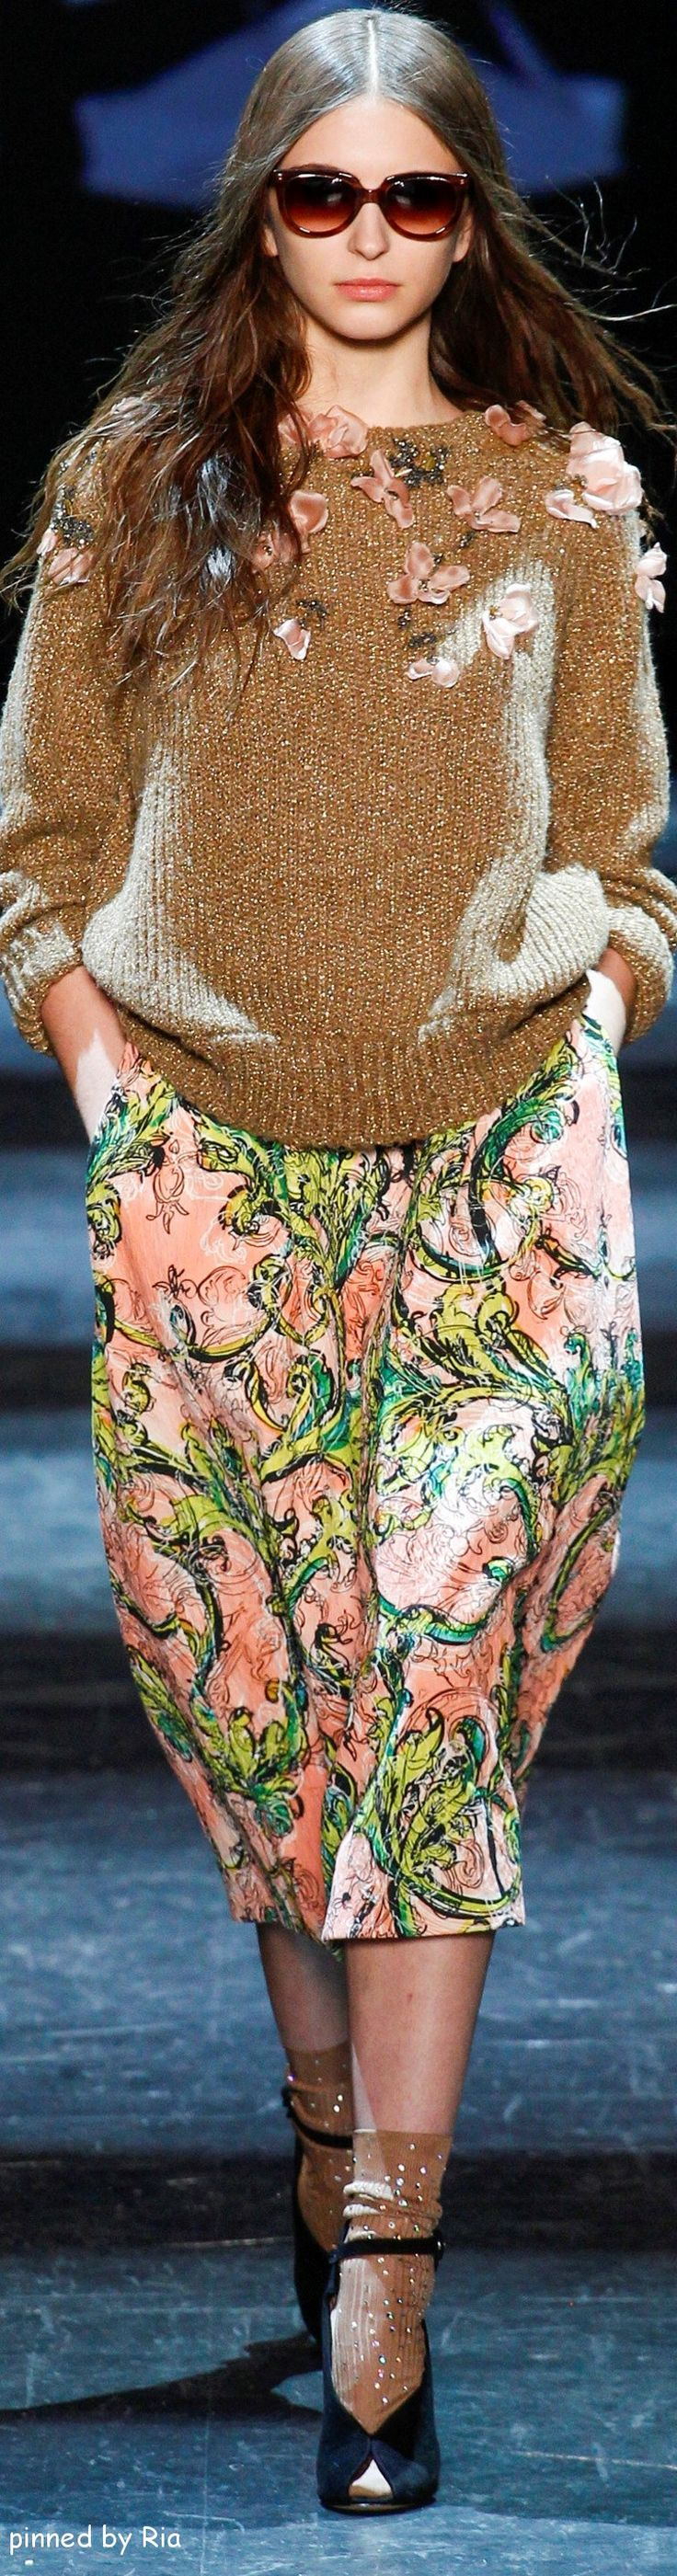 Monique Lhuillier F-16: embellished sweater, print skirt.